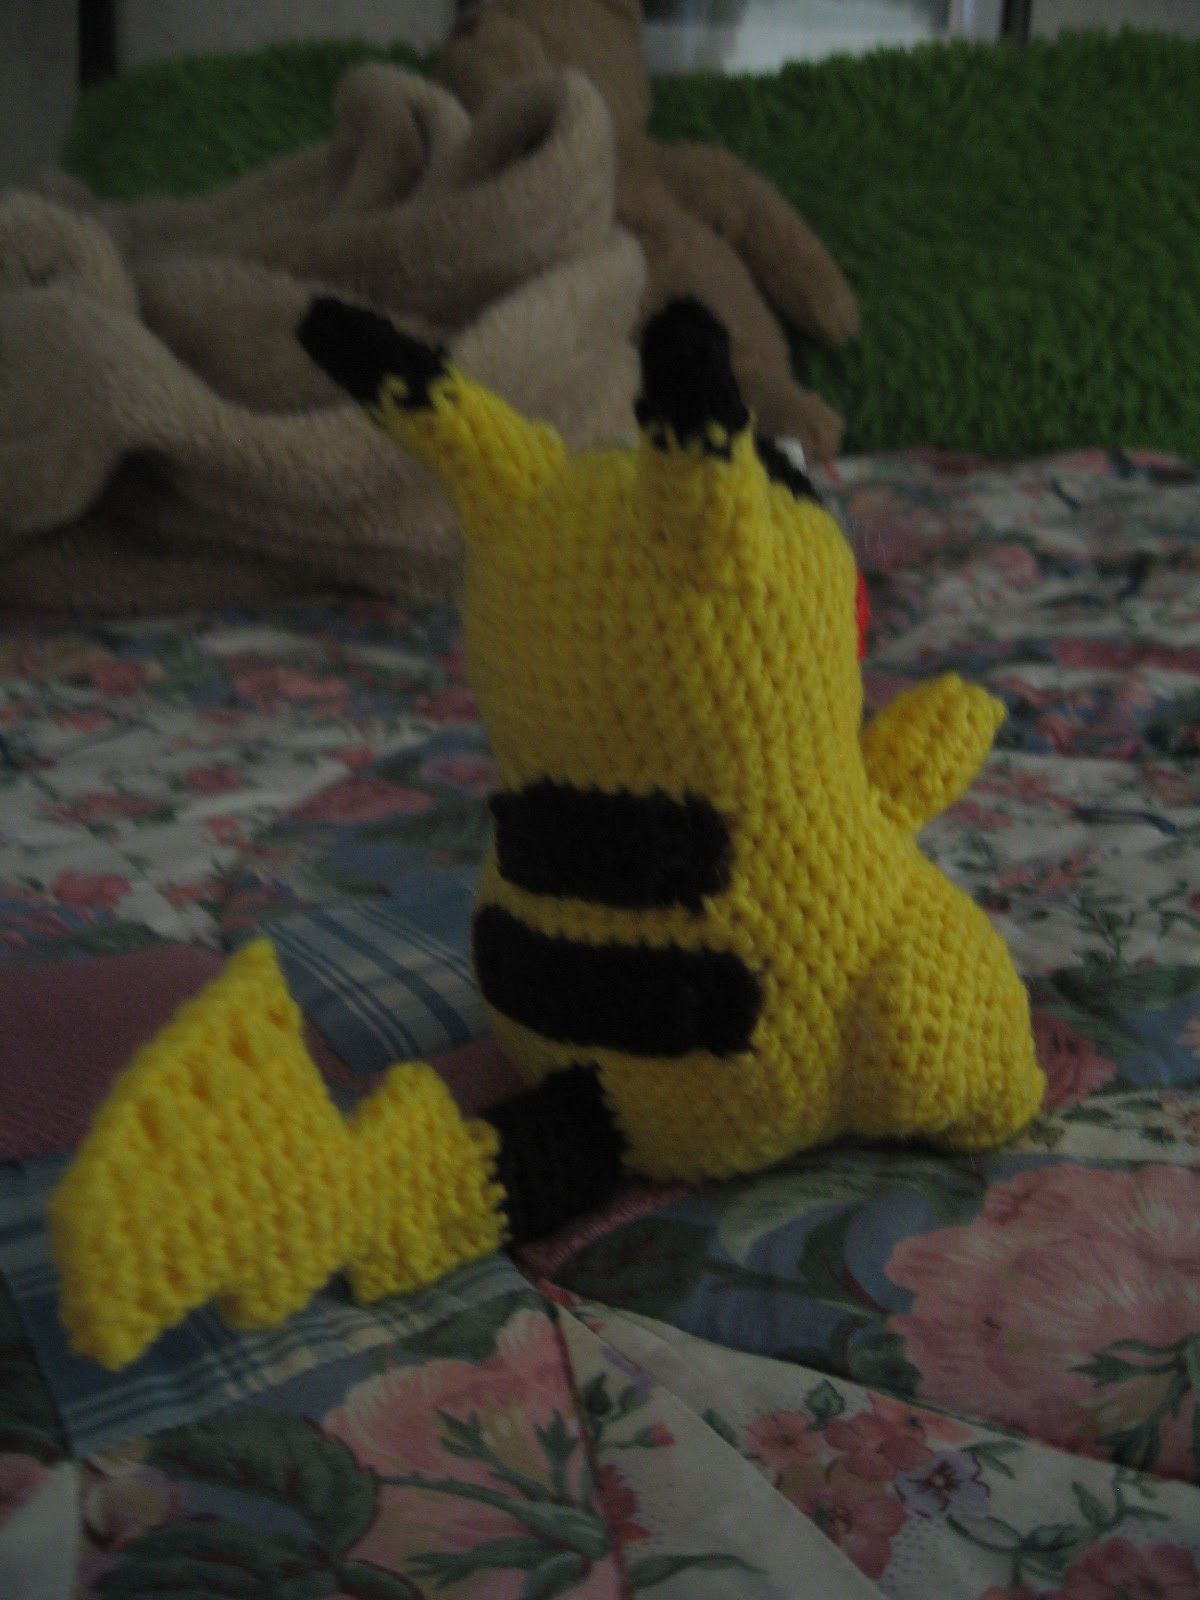 Pokemon Crochet Adventure!: Pikachu 2/151